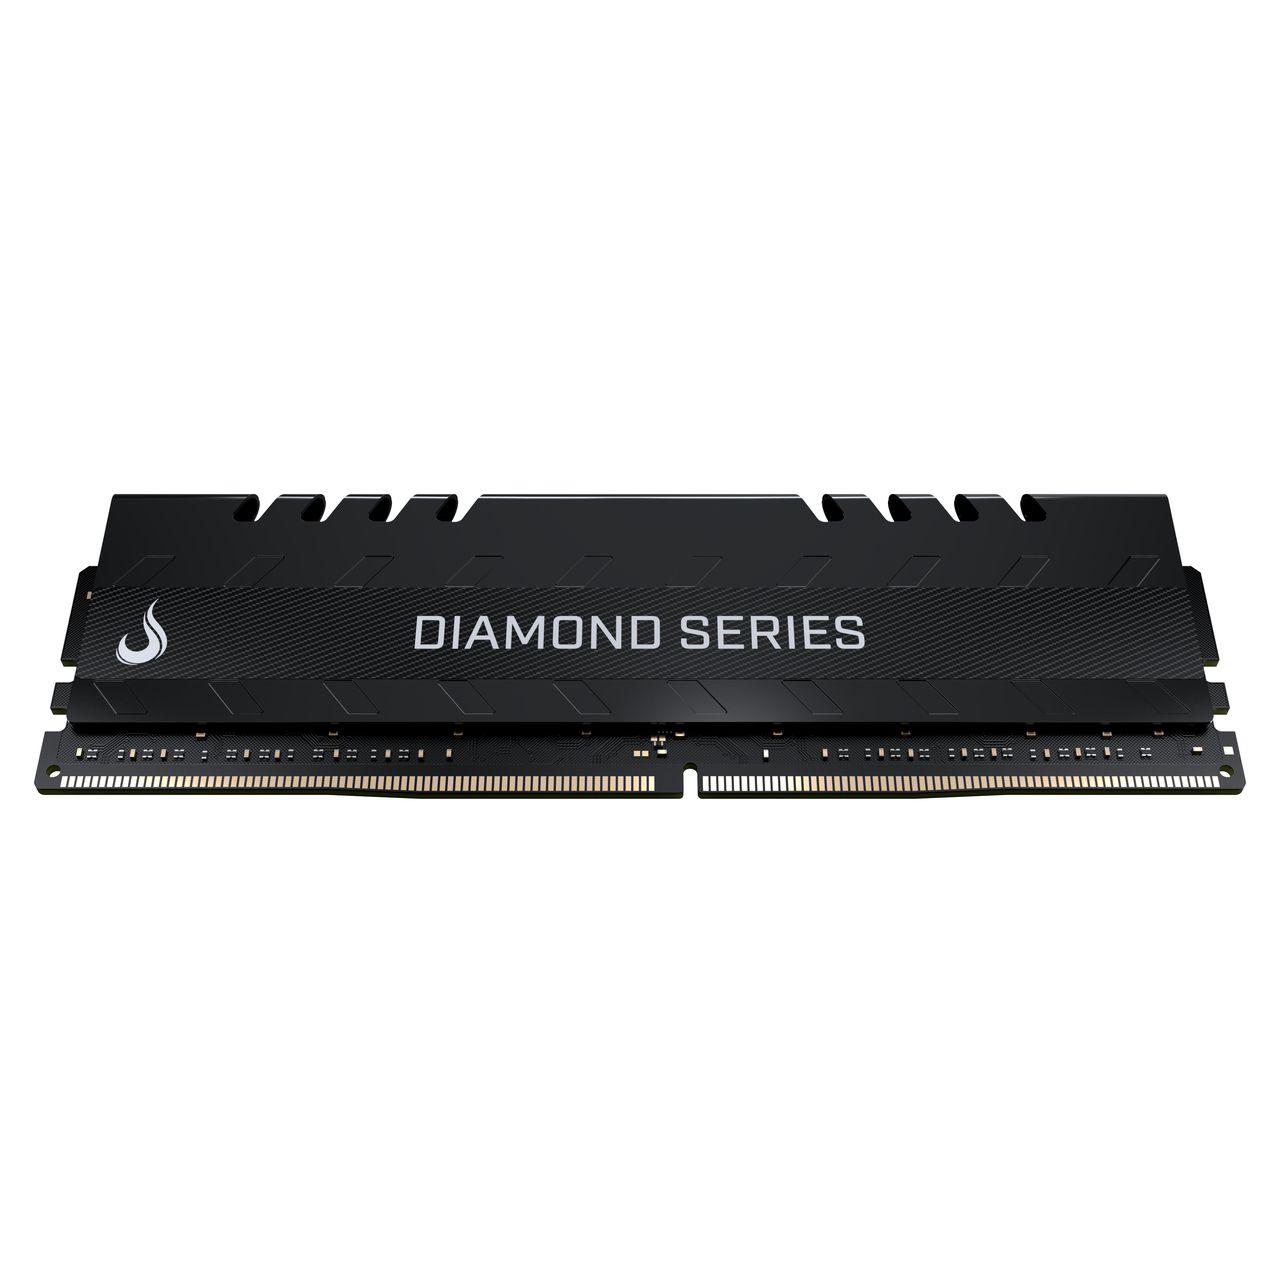 Memoria Ram DDR4 8GB 2400MHZ Diamond - RM-D4-8G-2400D BLACK  - Loja Rise Mode